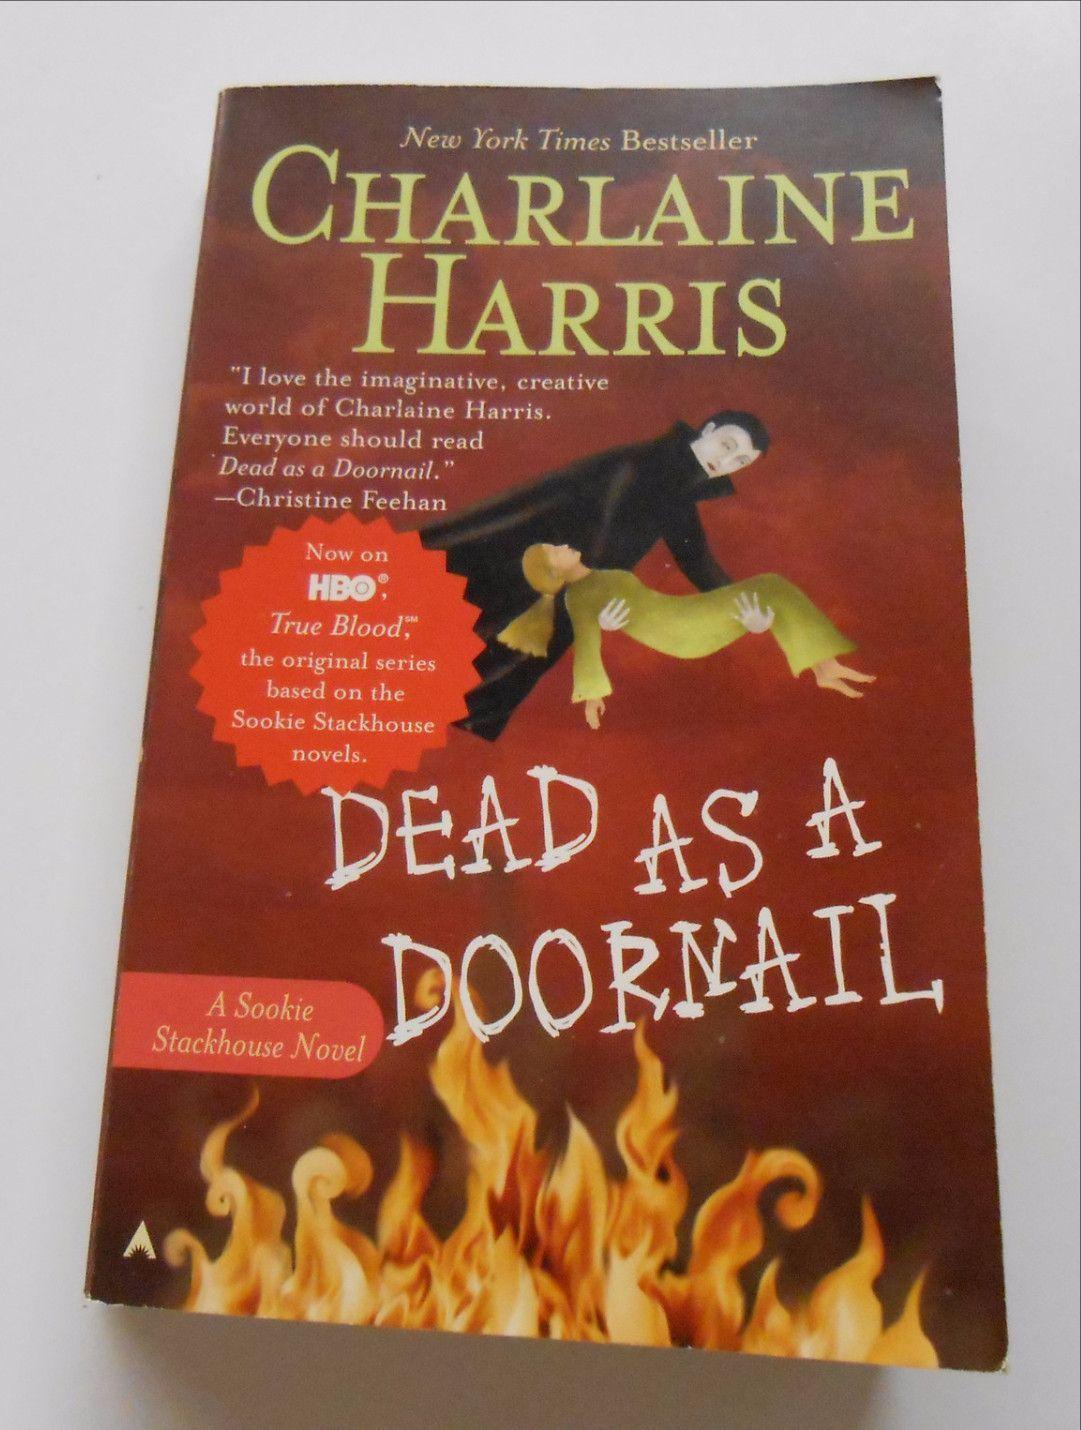 Dead As A Doornail by Charlaine Harris | Books | Pinterest | Books